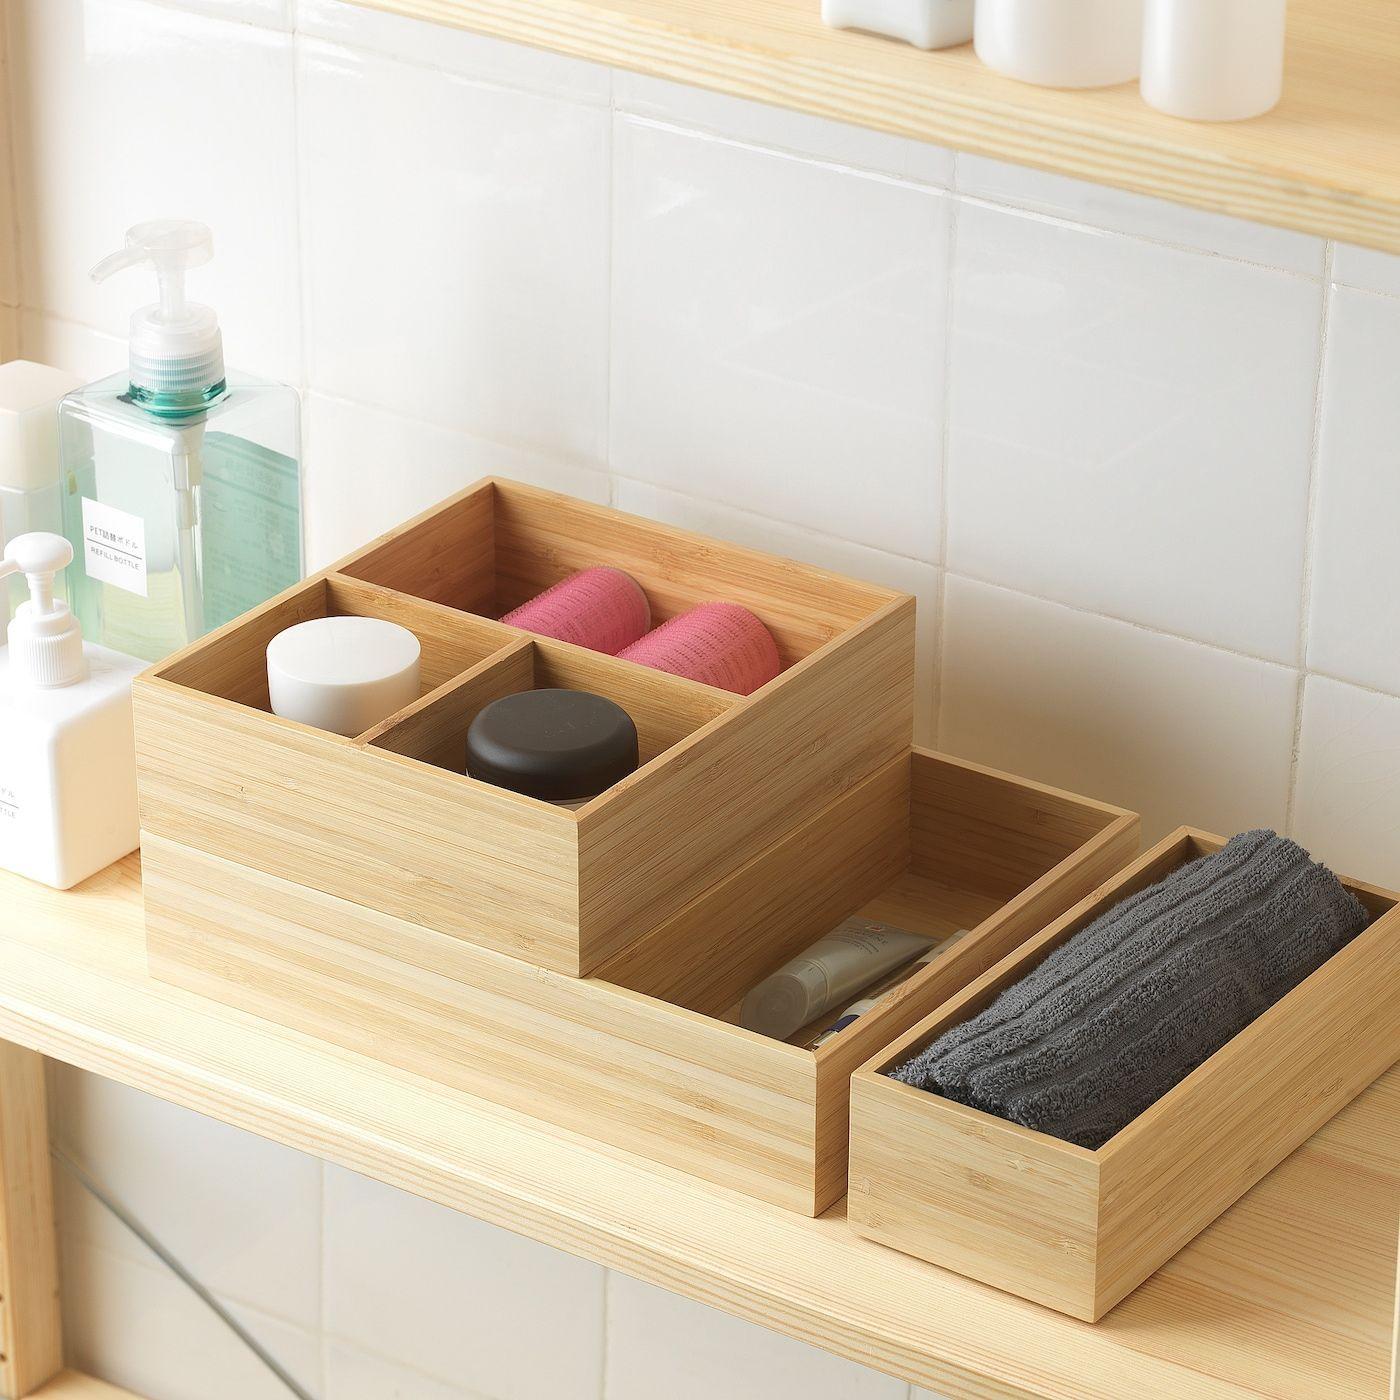 Hd Supply Bathroom Cabinets In 2020 Ikea Storage Ikea Storage